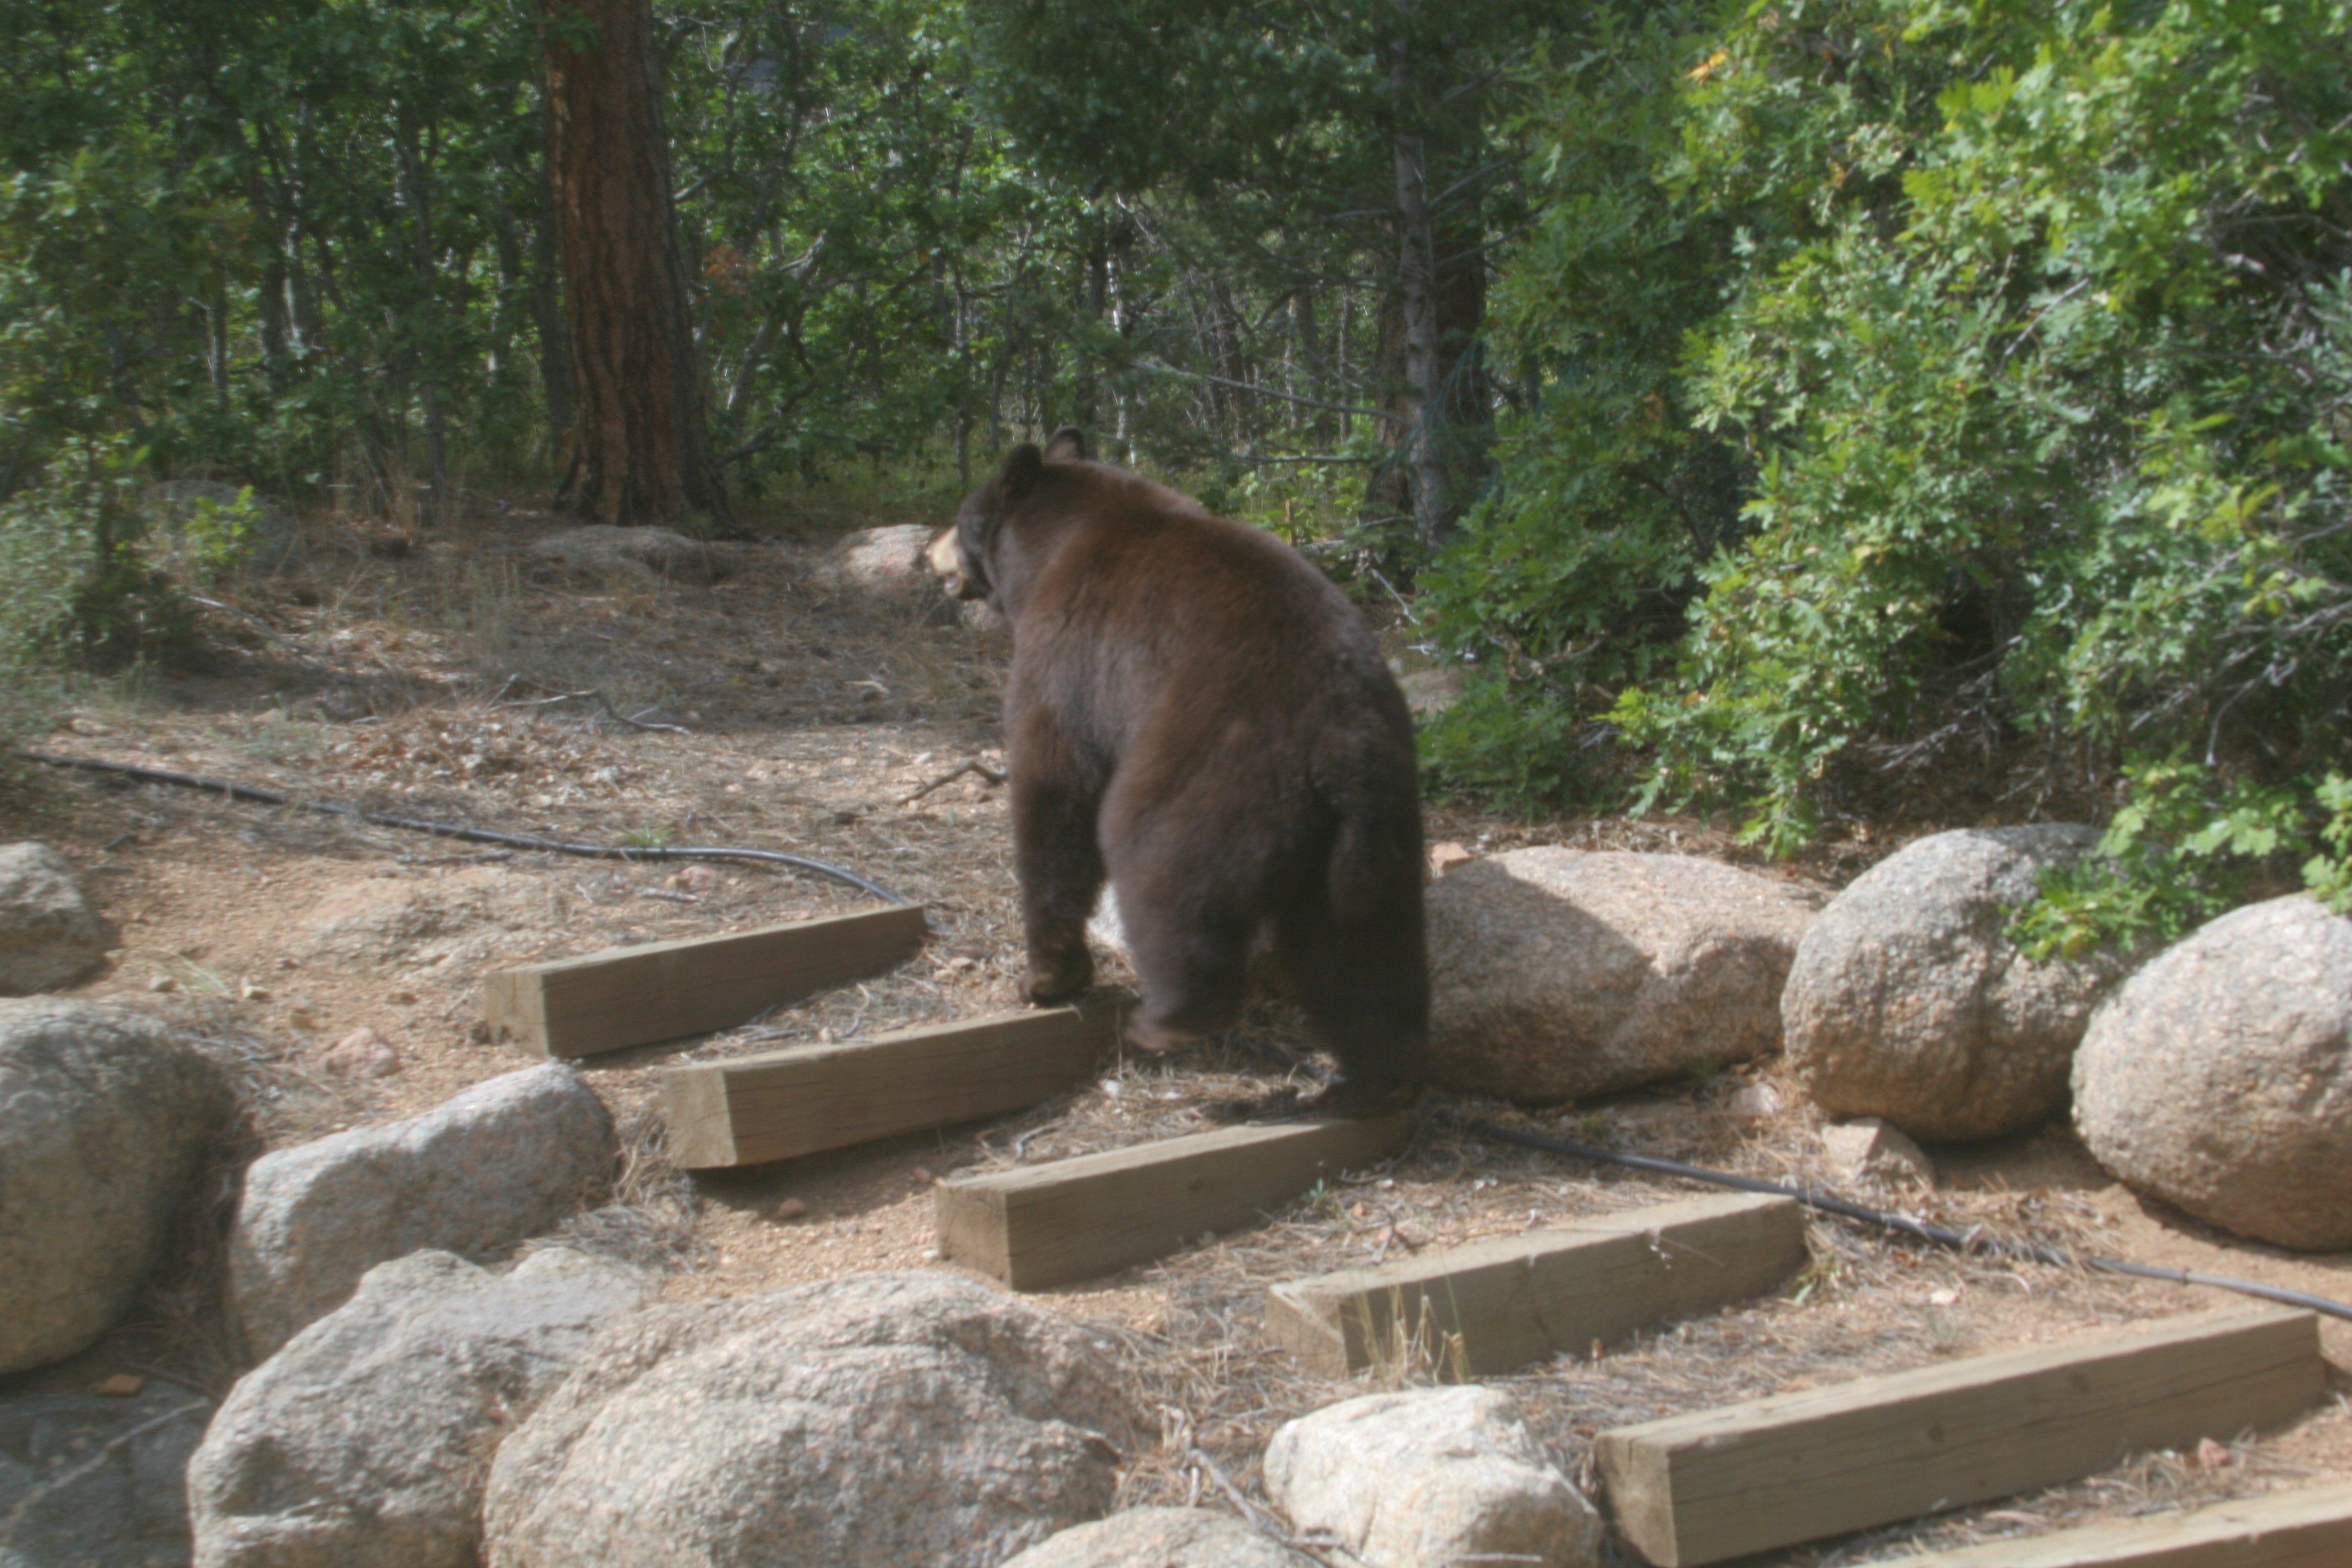 Bears Fox Deer Coyote Mountain Lion Wildlife Oh My